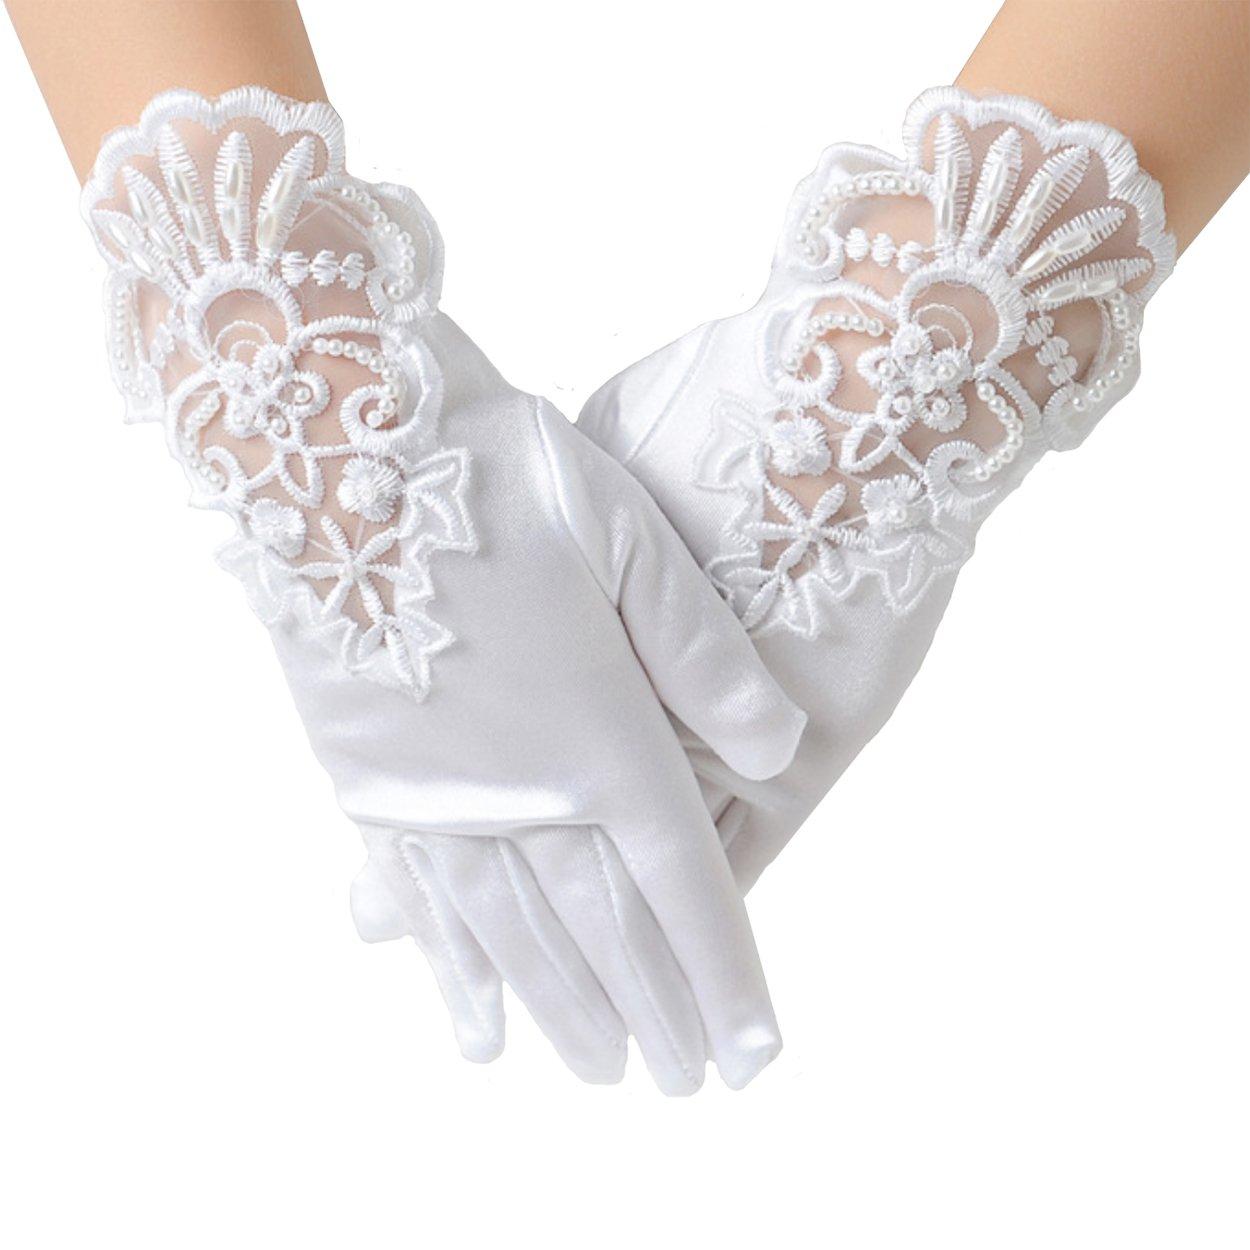 Elesa Miracle Girl Embroidered White Satin Formal Gloves, Child Size Wrist Length Gloves, for Age 4-7 Years ( Wrist Embroidered White)